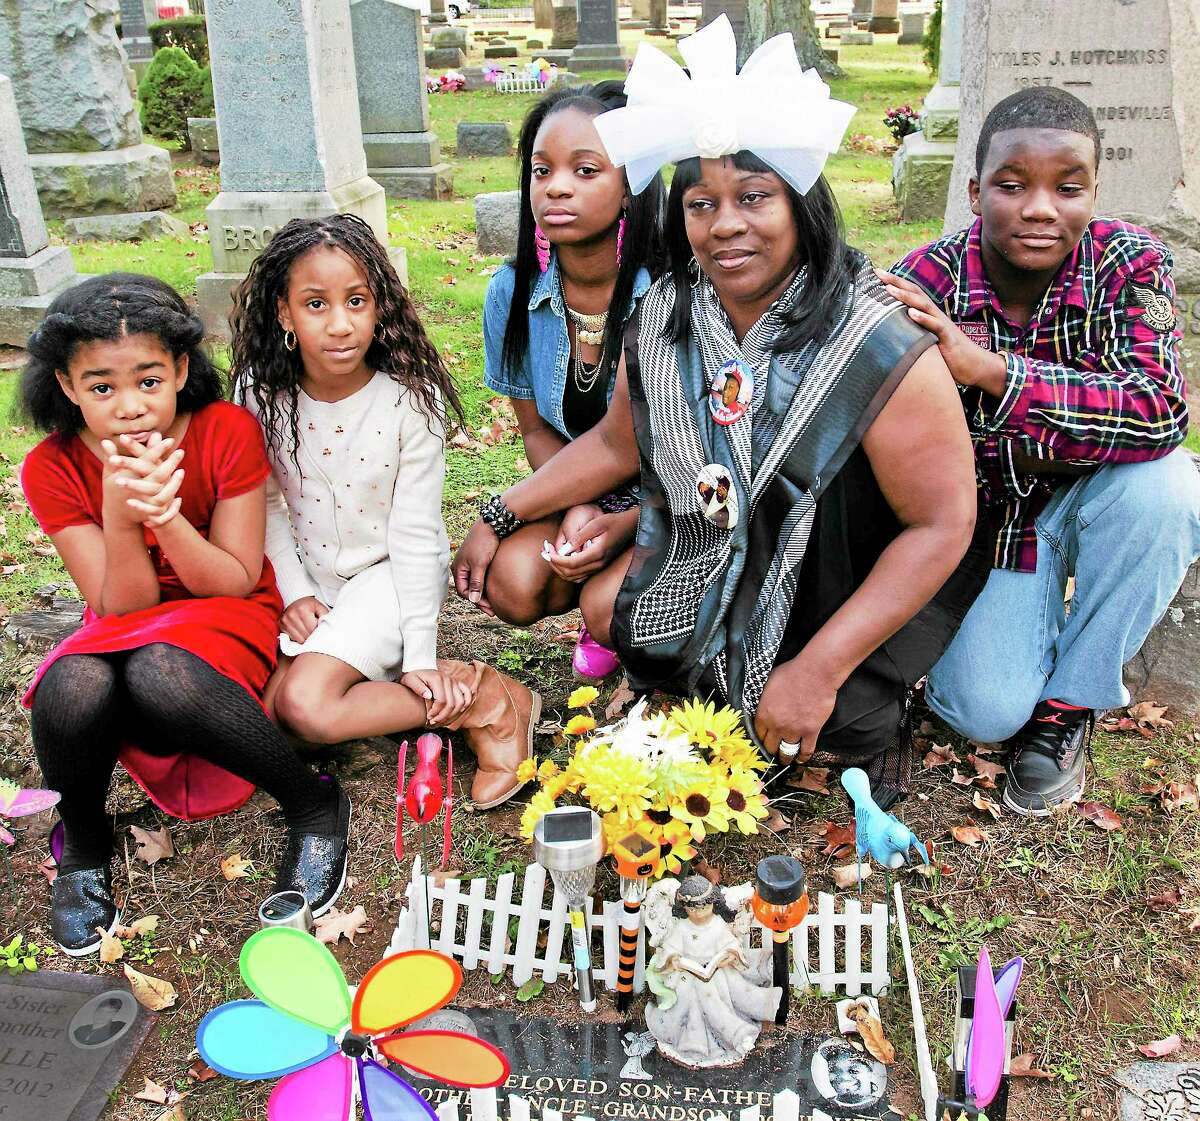 Melanie Stengel — New Haven Register From left, Shanya Holland, 8; Shannon Eaddy, 7; Marquise Eaddy Jr., 12; Tenajah McFadden, 15; and Barbara Eaddy at the gravesite of Marquise Eaddy, the chioldren's father and Barbara Eaddy's son.